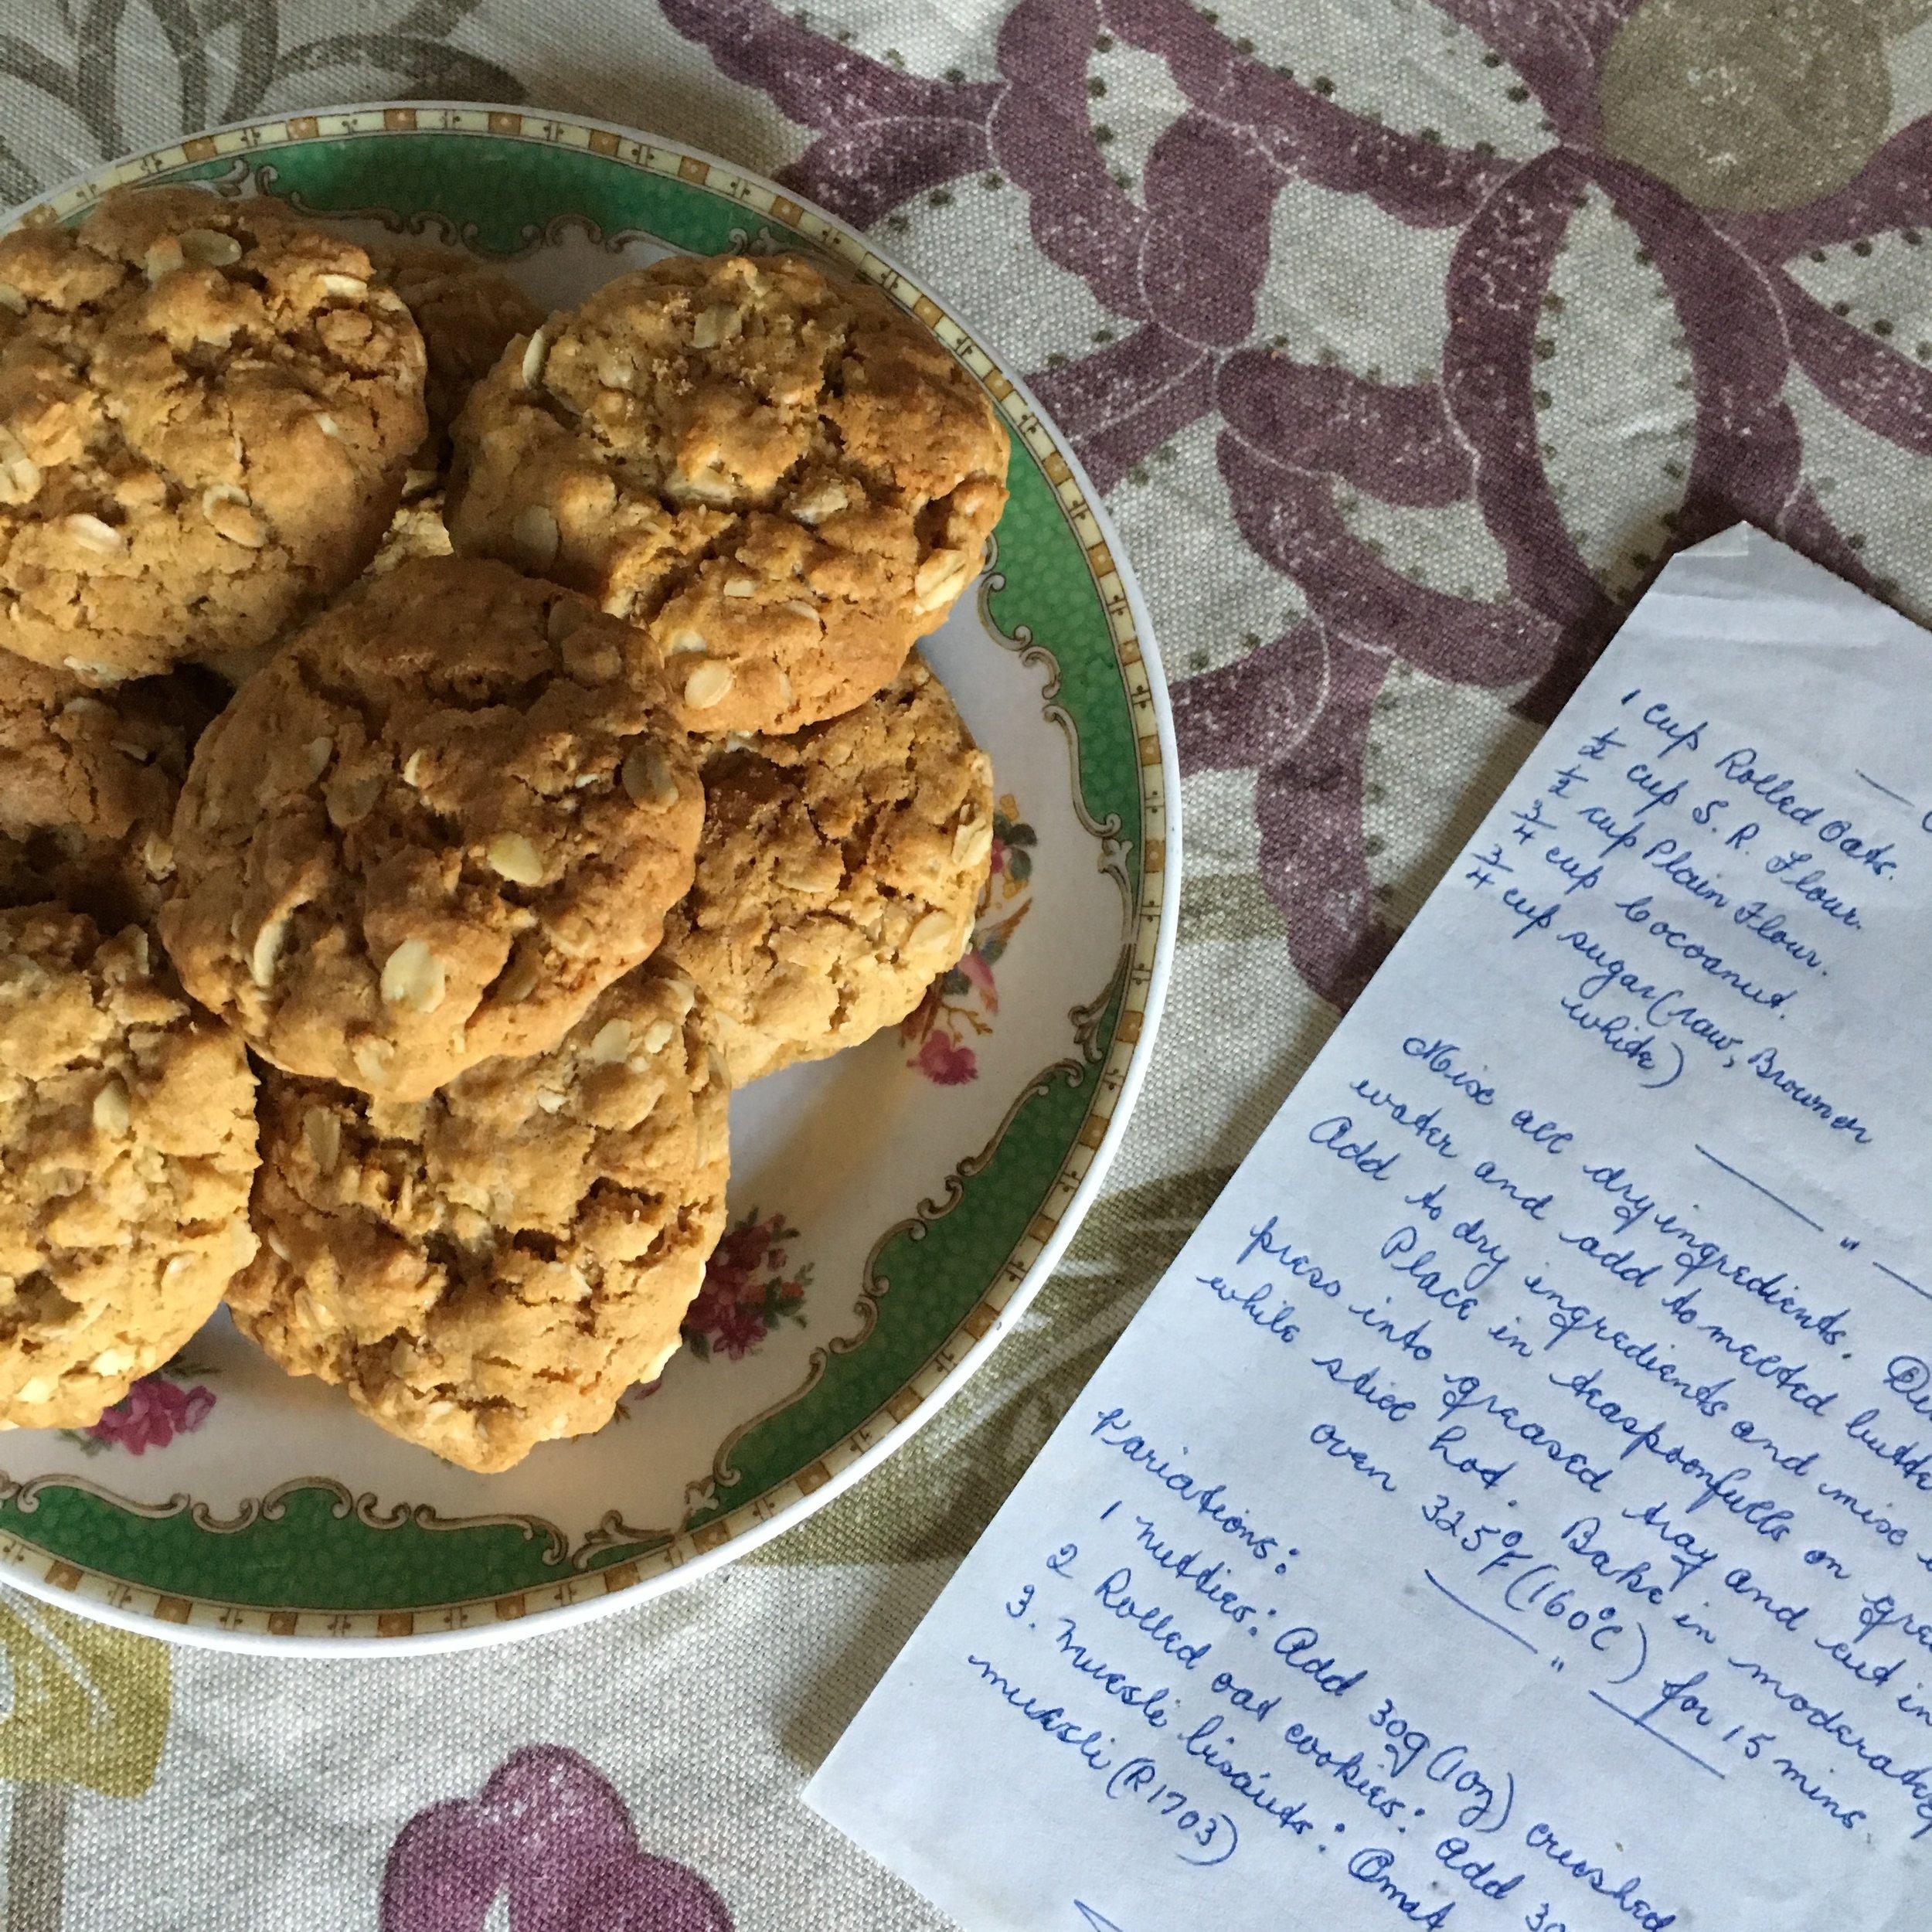 Last year's batch, made in London, to Nan's original recipe!